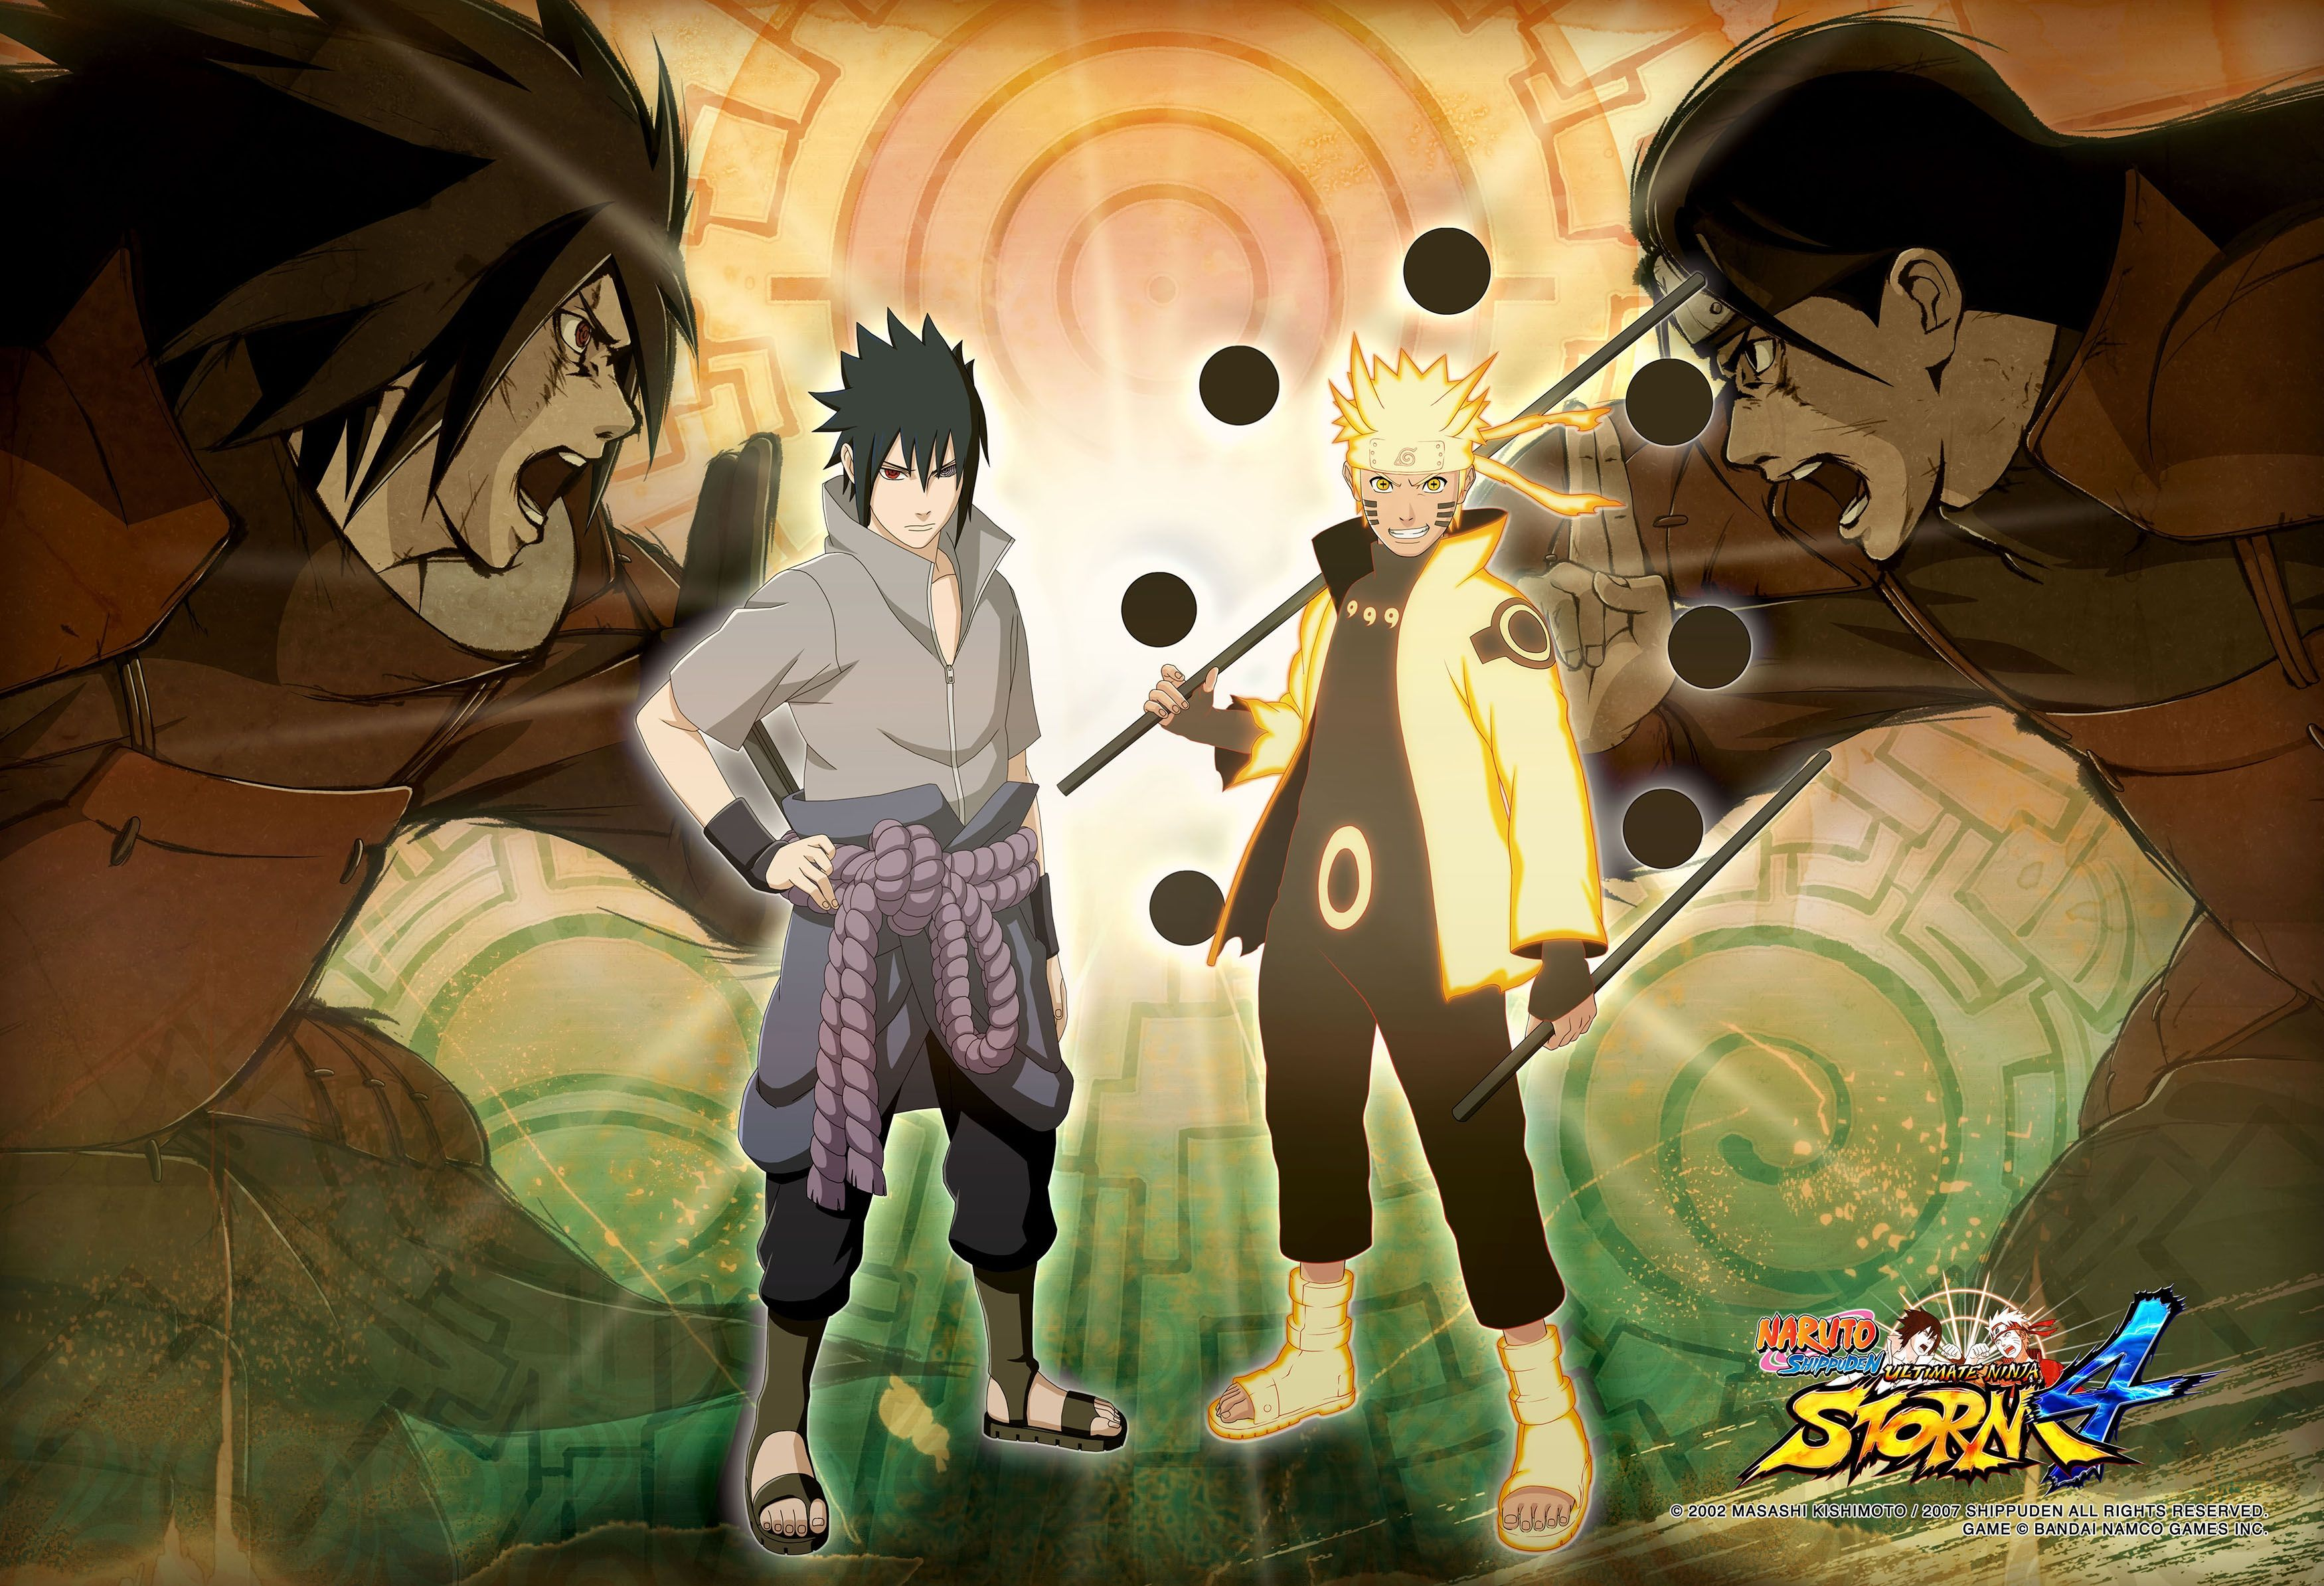 Ps4 Naruto Wallpapers Top Free Ps4 Naruto Backgrounds Wallpaperaccess